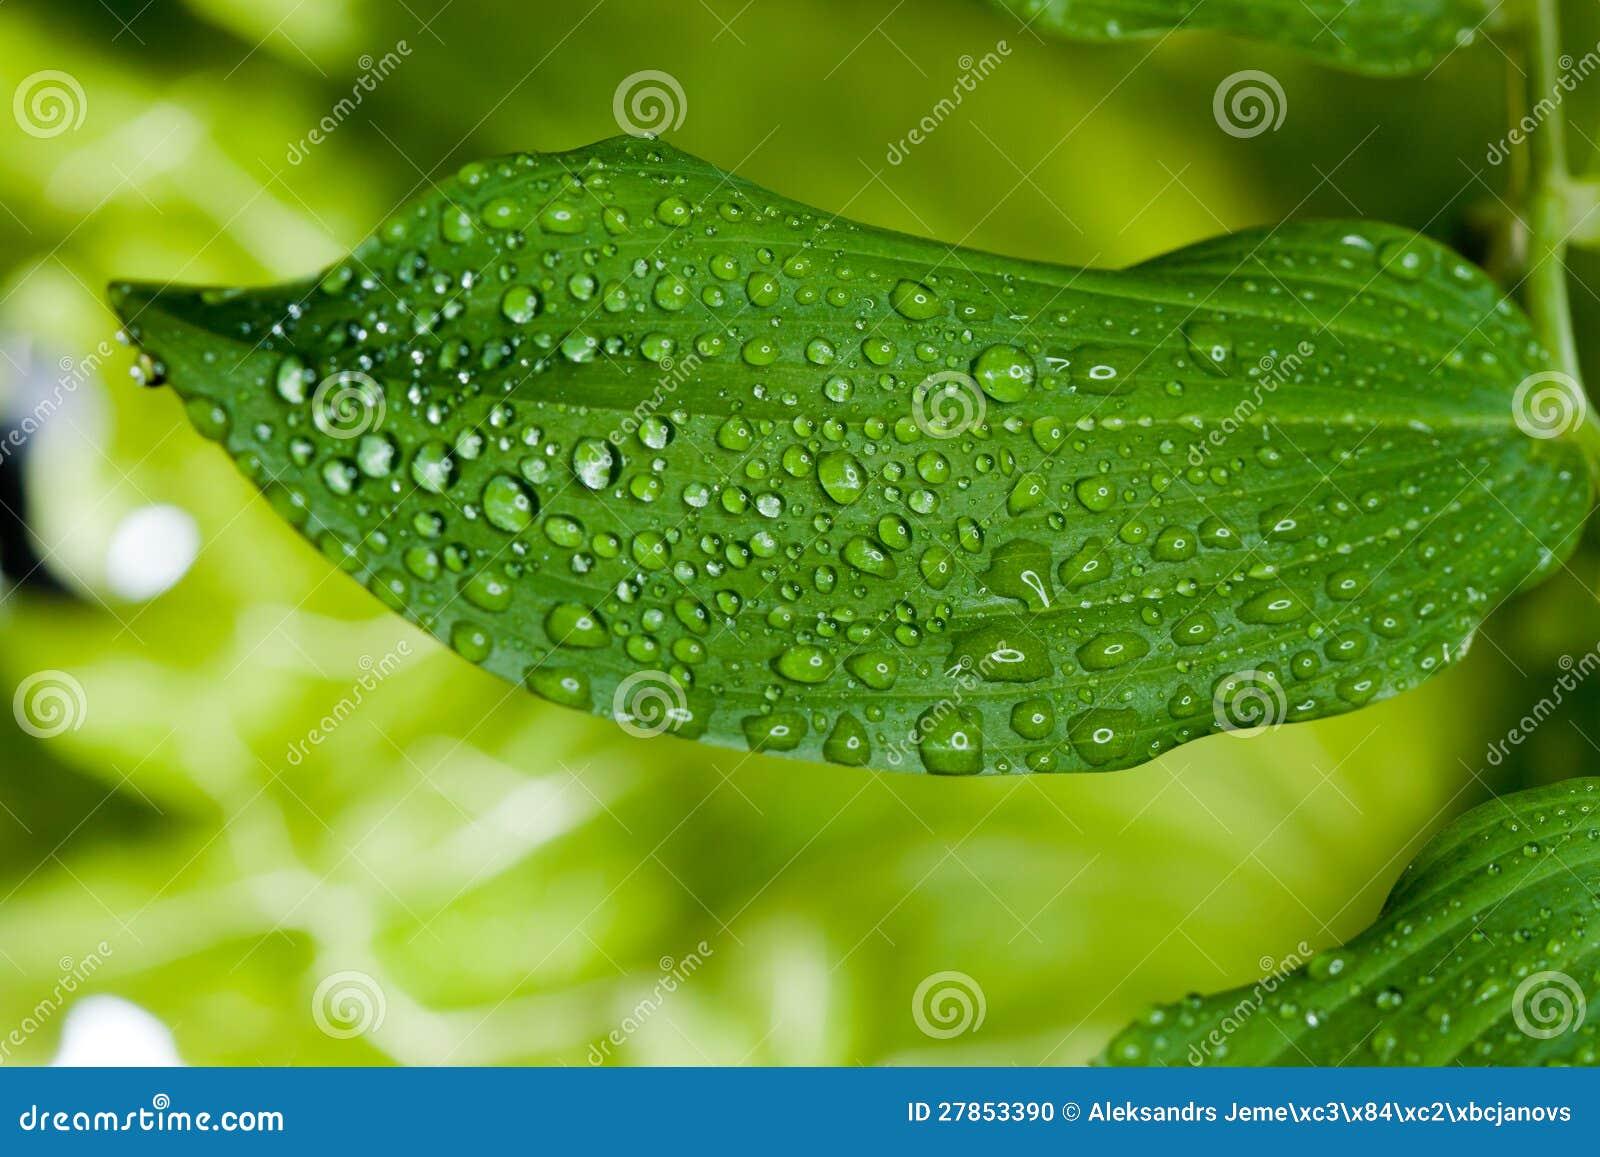 Innaffi le gocce sulla pianta